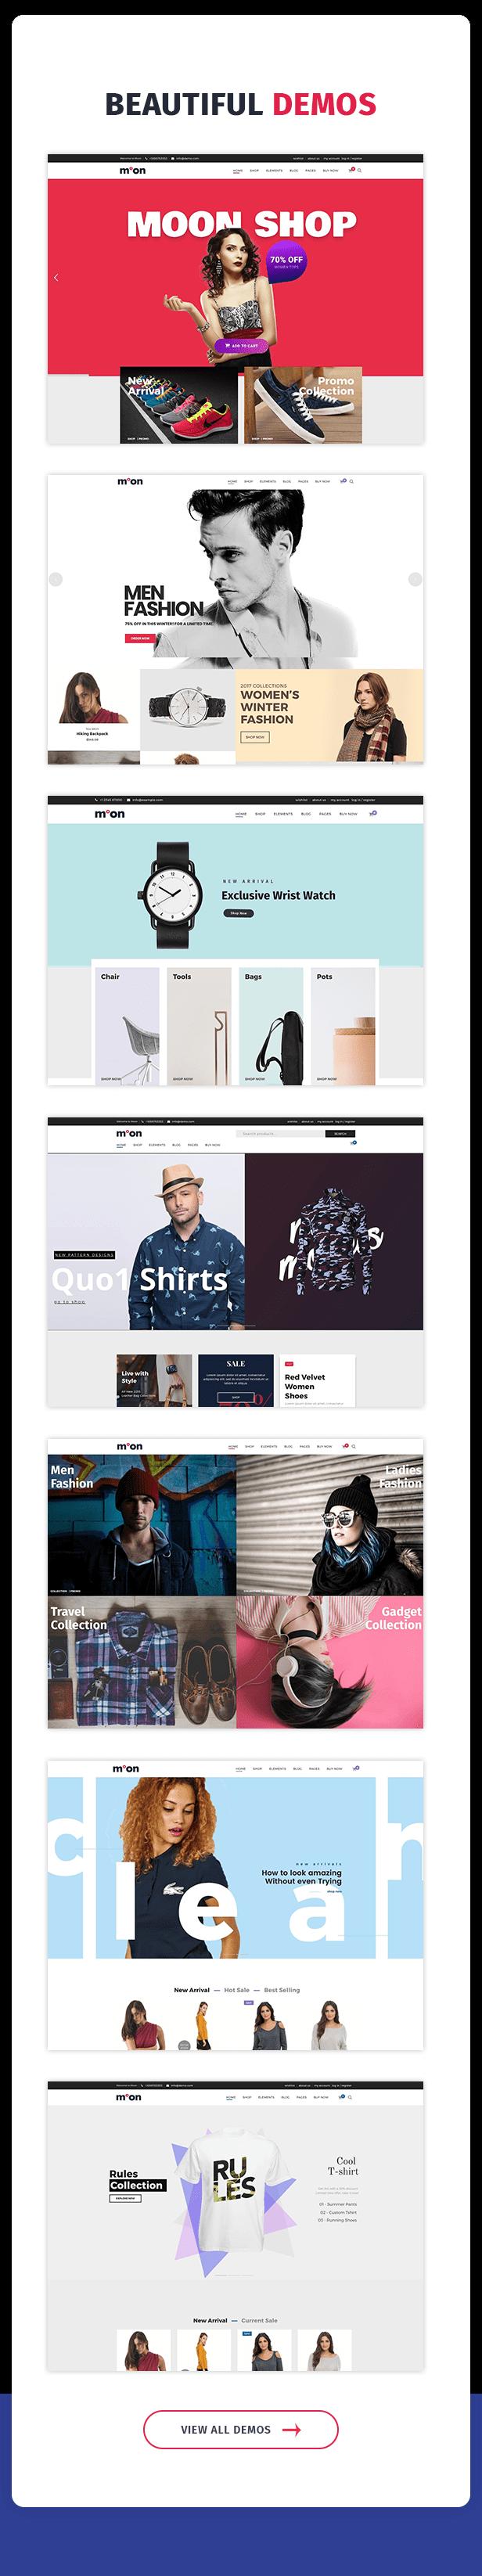 Moon Shop - سمة WordPress للتجارة الإلكترونية المستجيبة لـ WooCommerce - 9